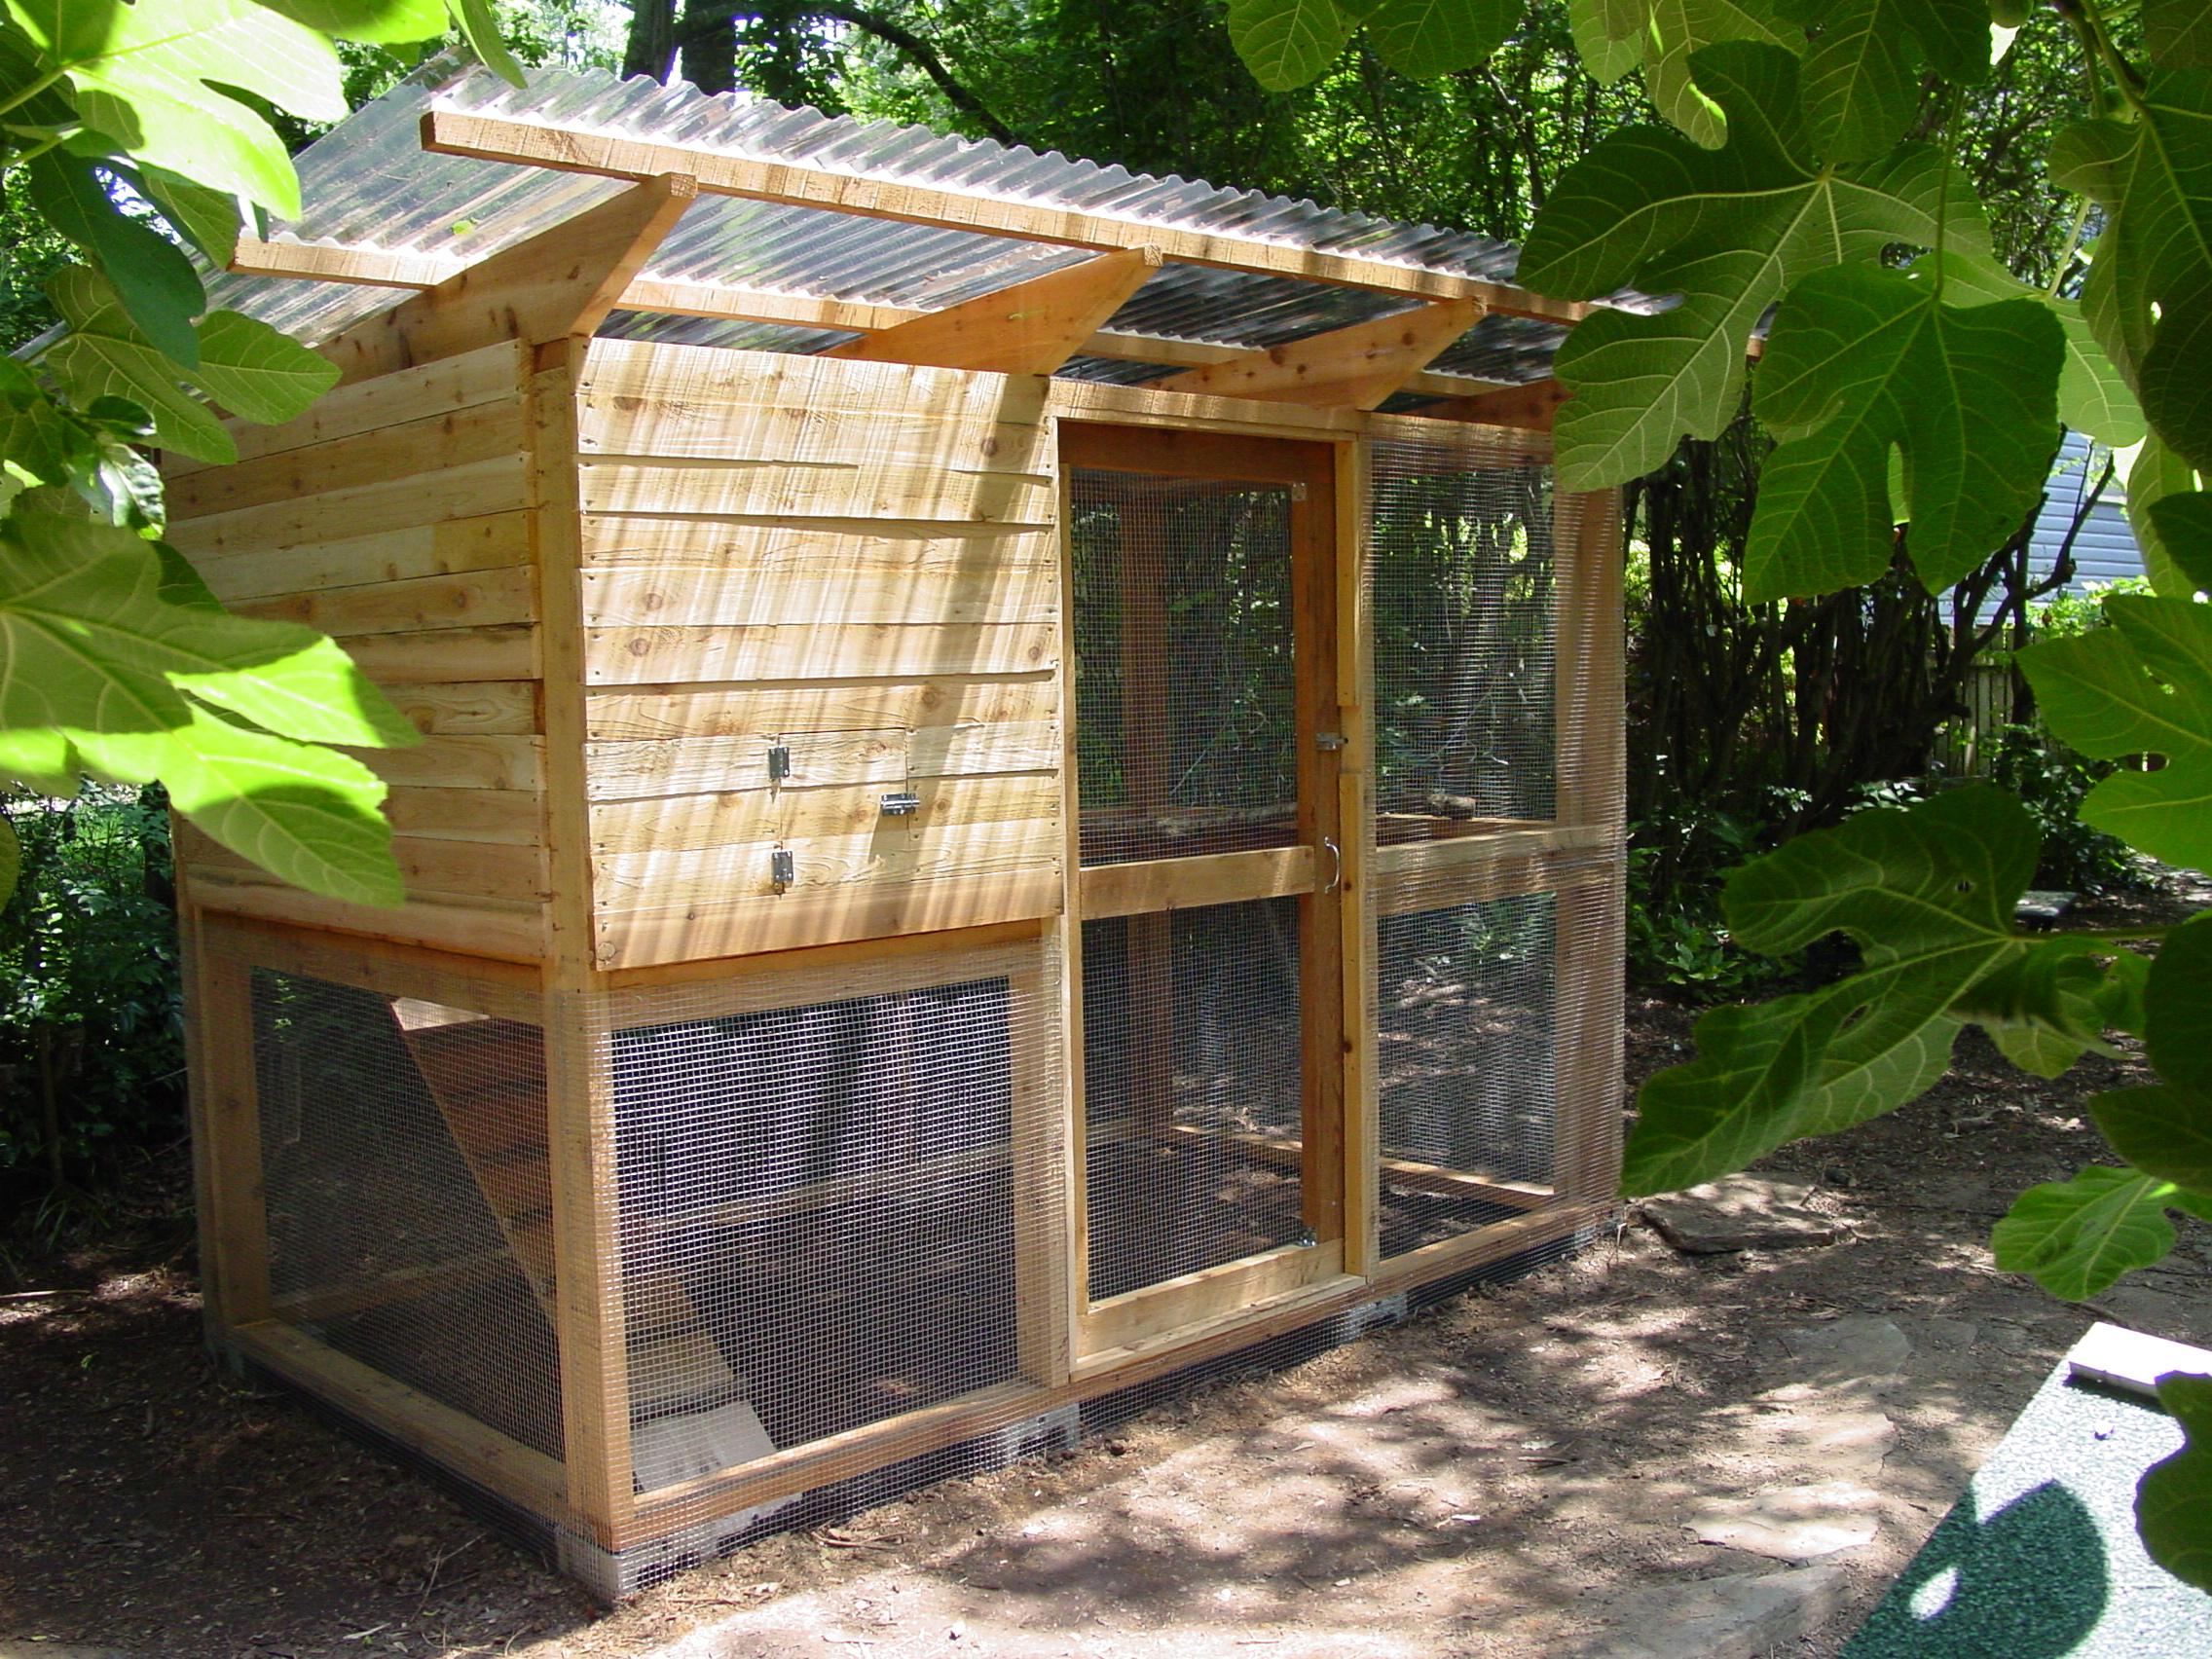 Microfarm Organic Gardens